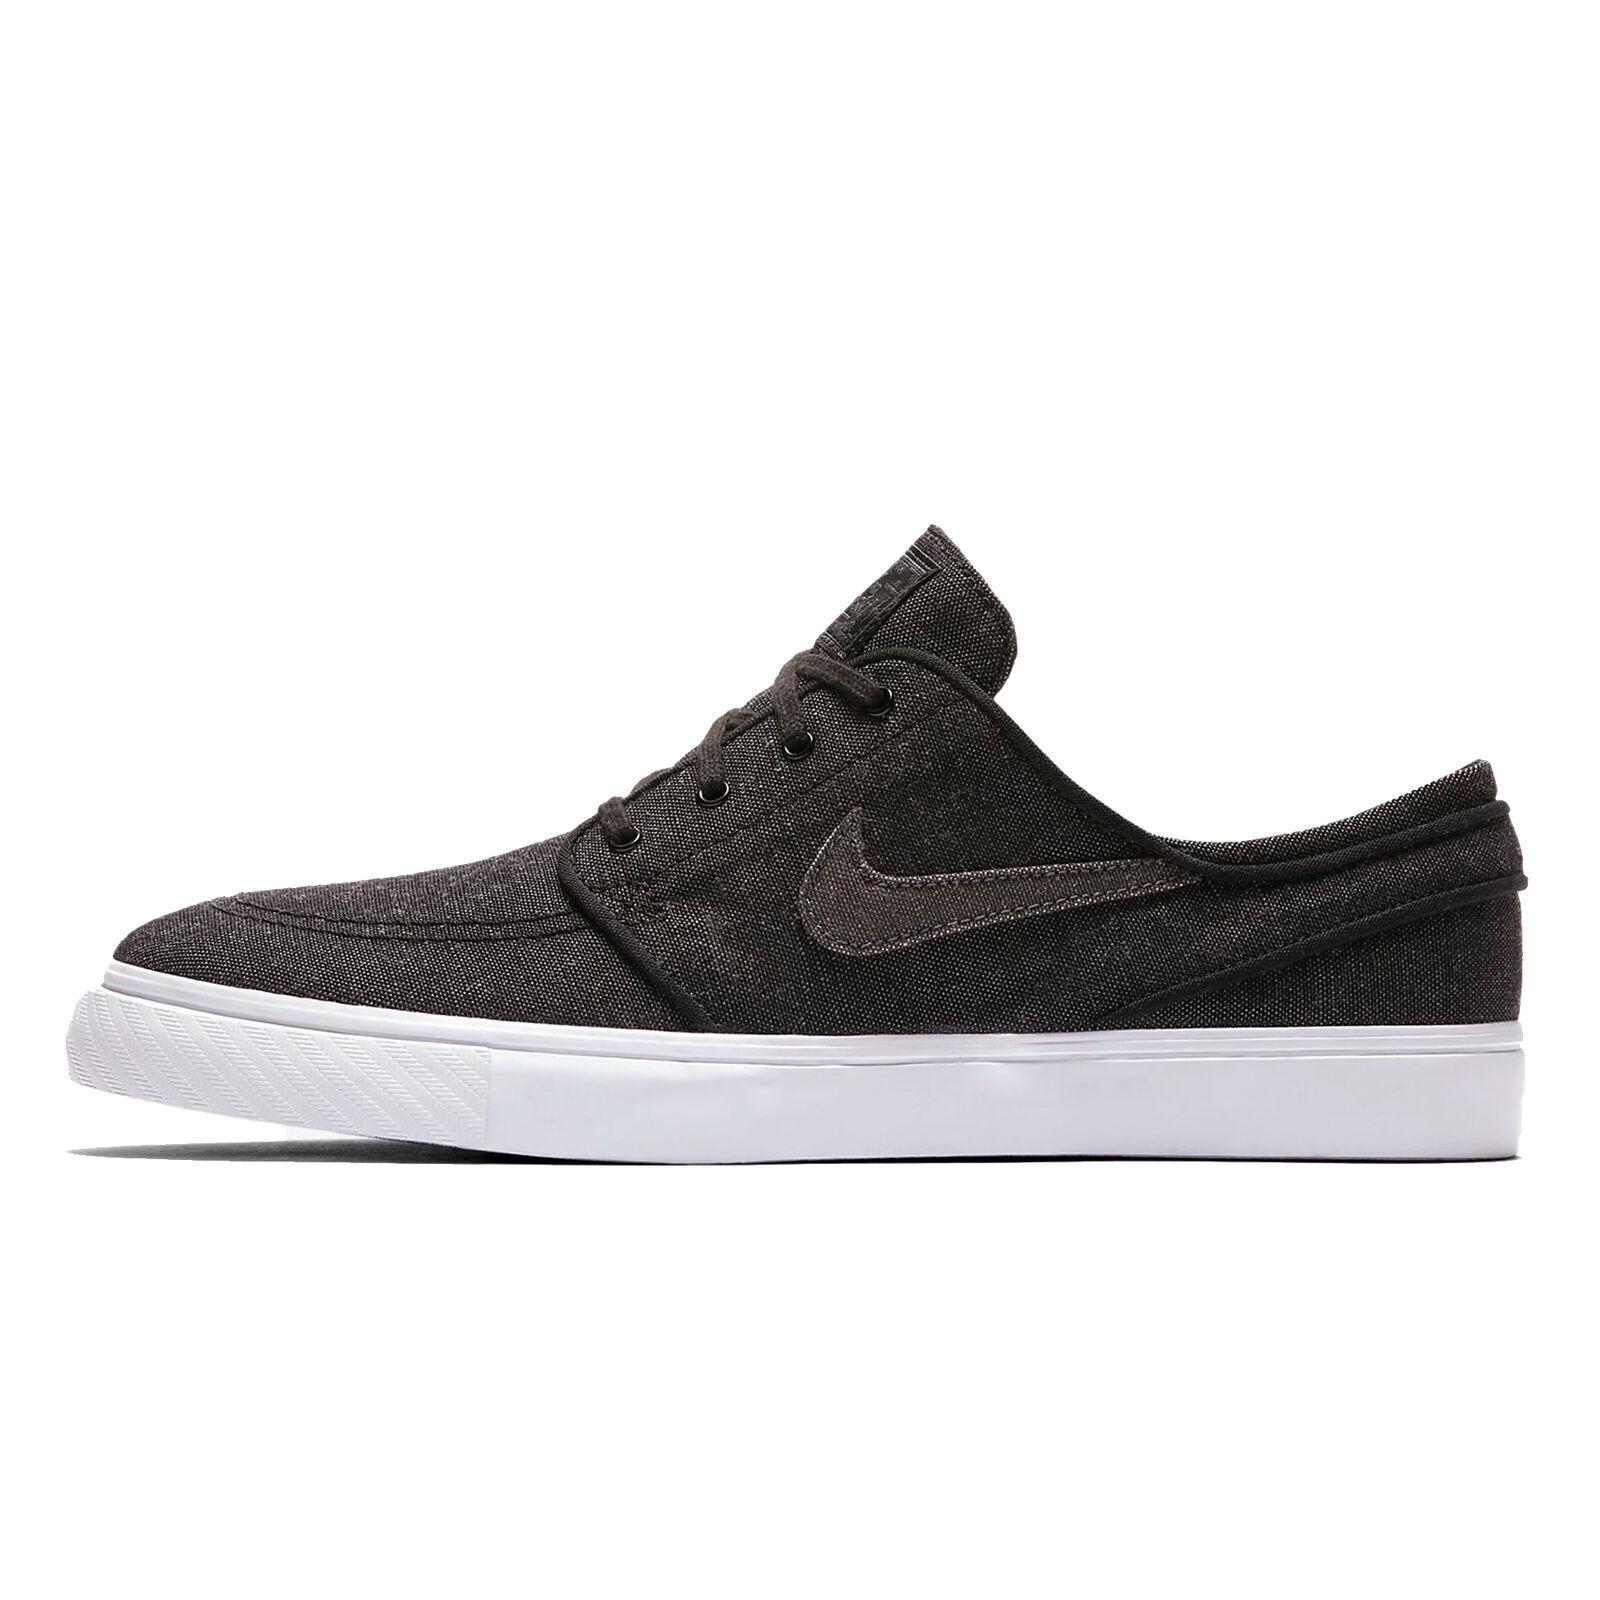 Nike SB Zoom Stefan Janoski CVS DC AH6417-001 Freizeit Sport Skateschuh Sneaker